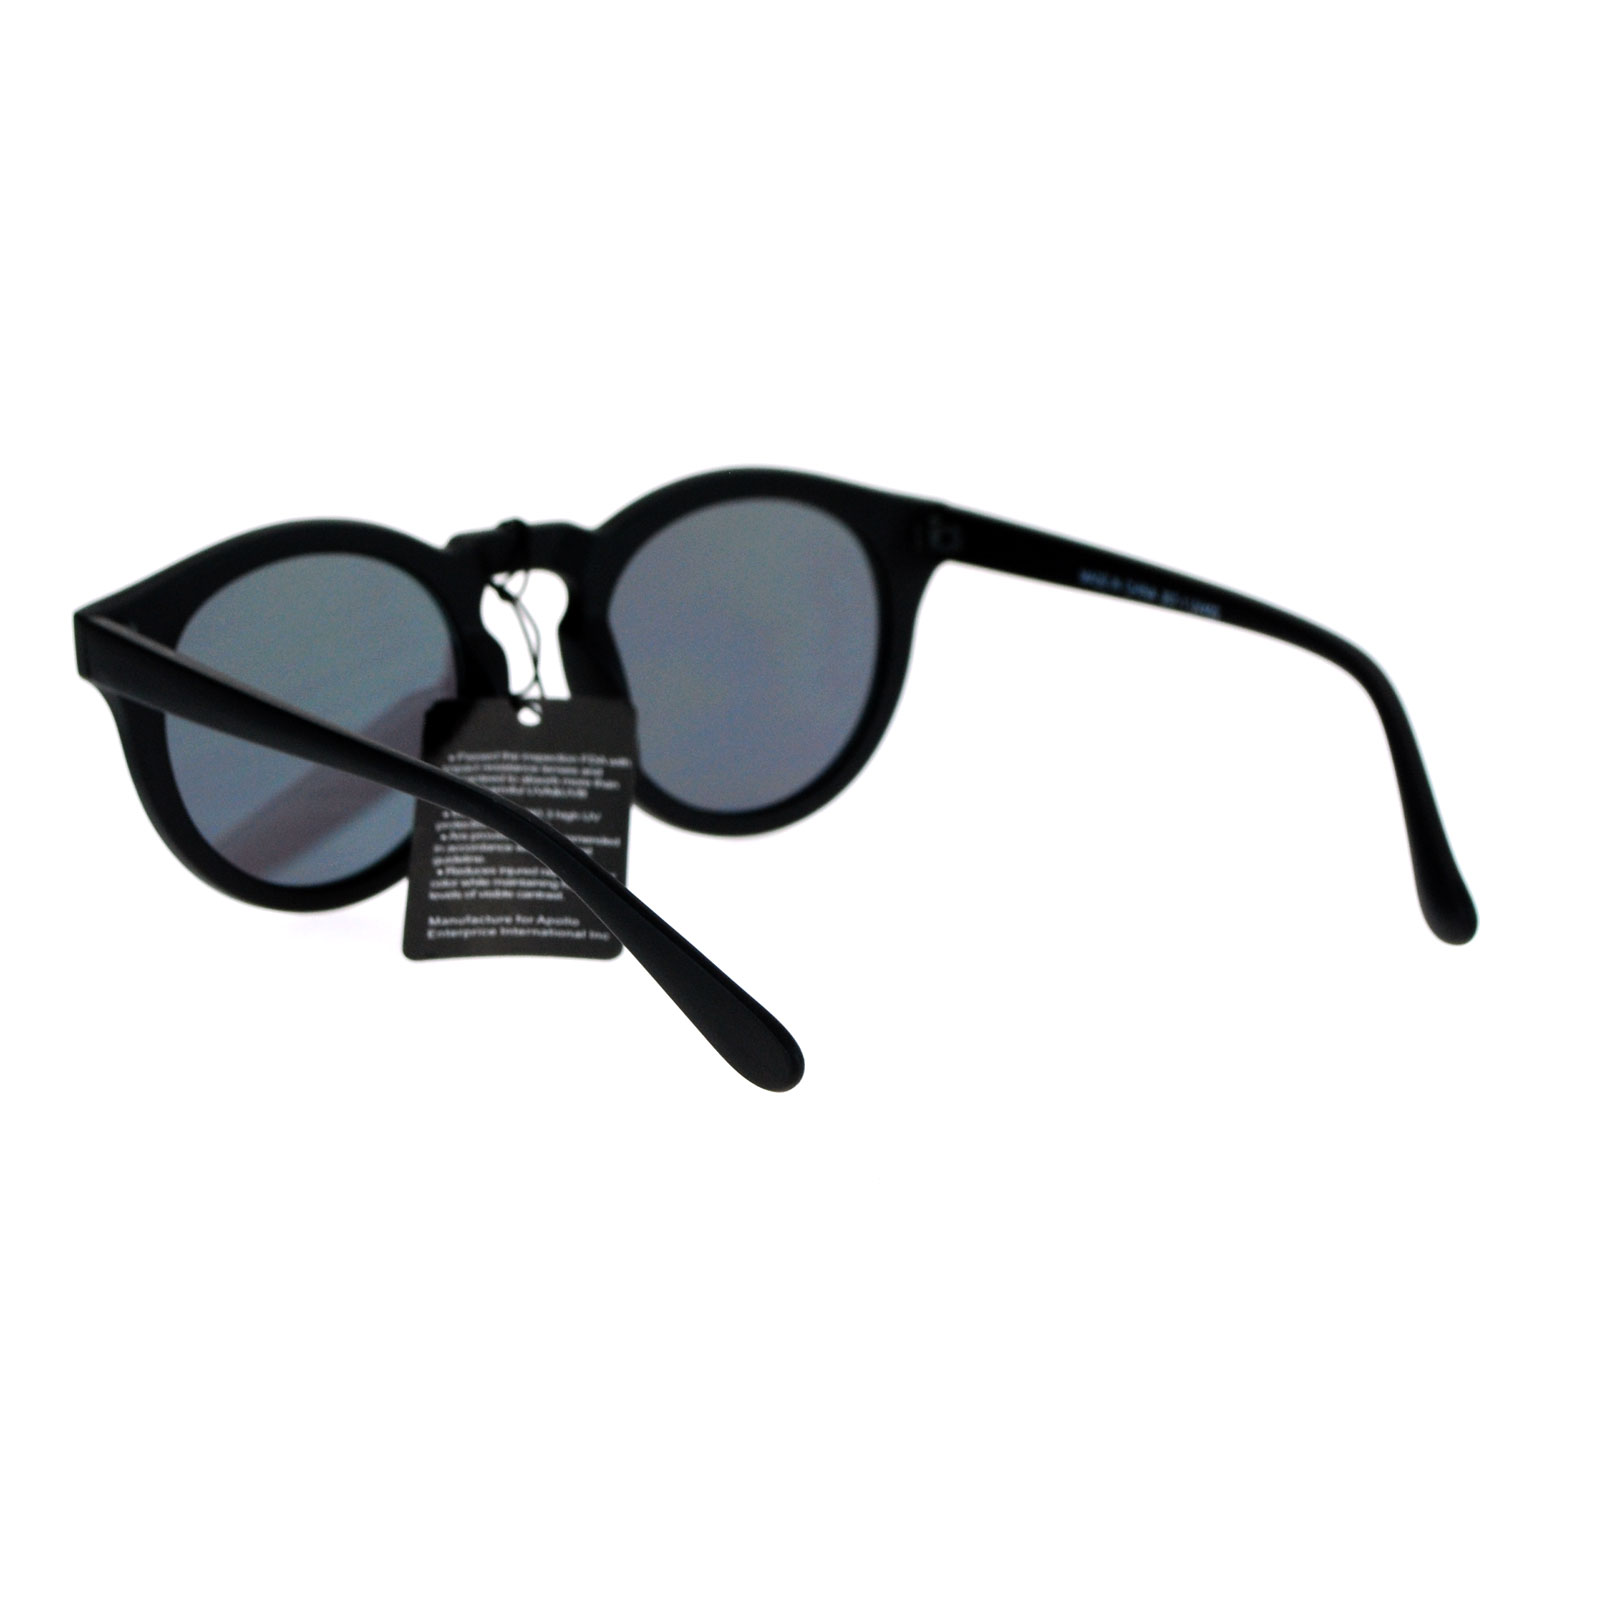 d4aeceac5c SA106 Flat Color Mirror Lens Horn Rim Keyhole Retro Round Hipster ...